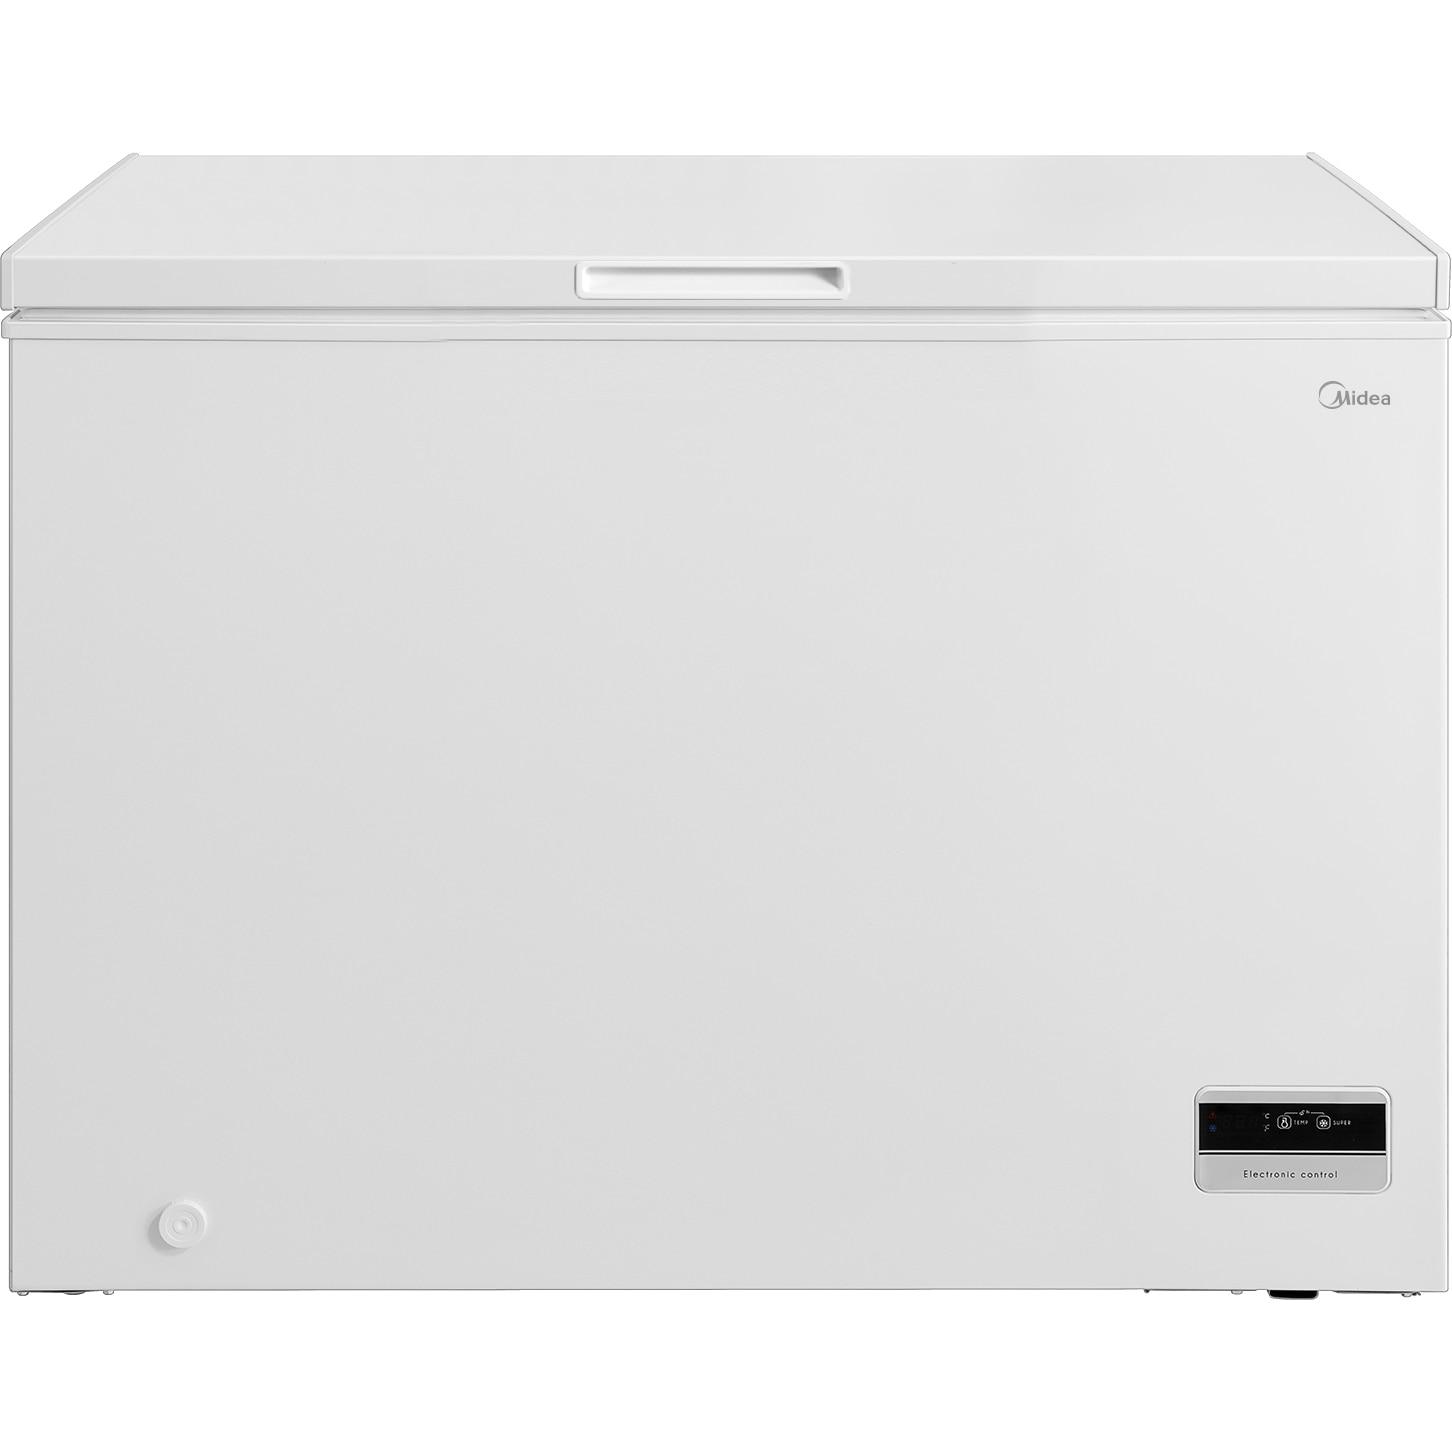 Fotografie Lada frigorifica MIDEA MDRC405FZF01CE, 290l, Control Digital, Functie frigider, Clasa F, Alb